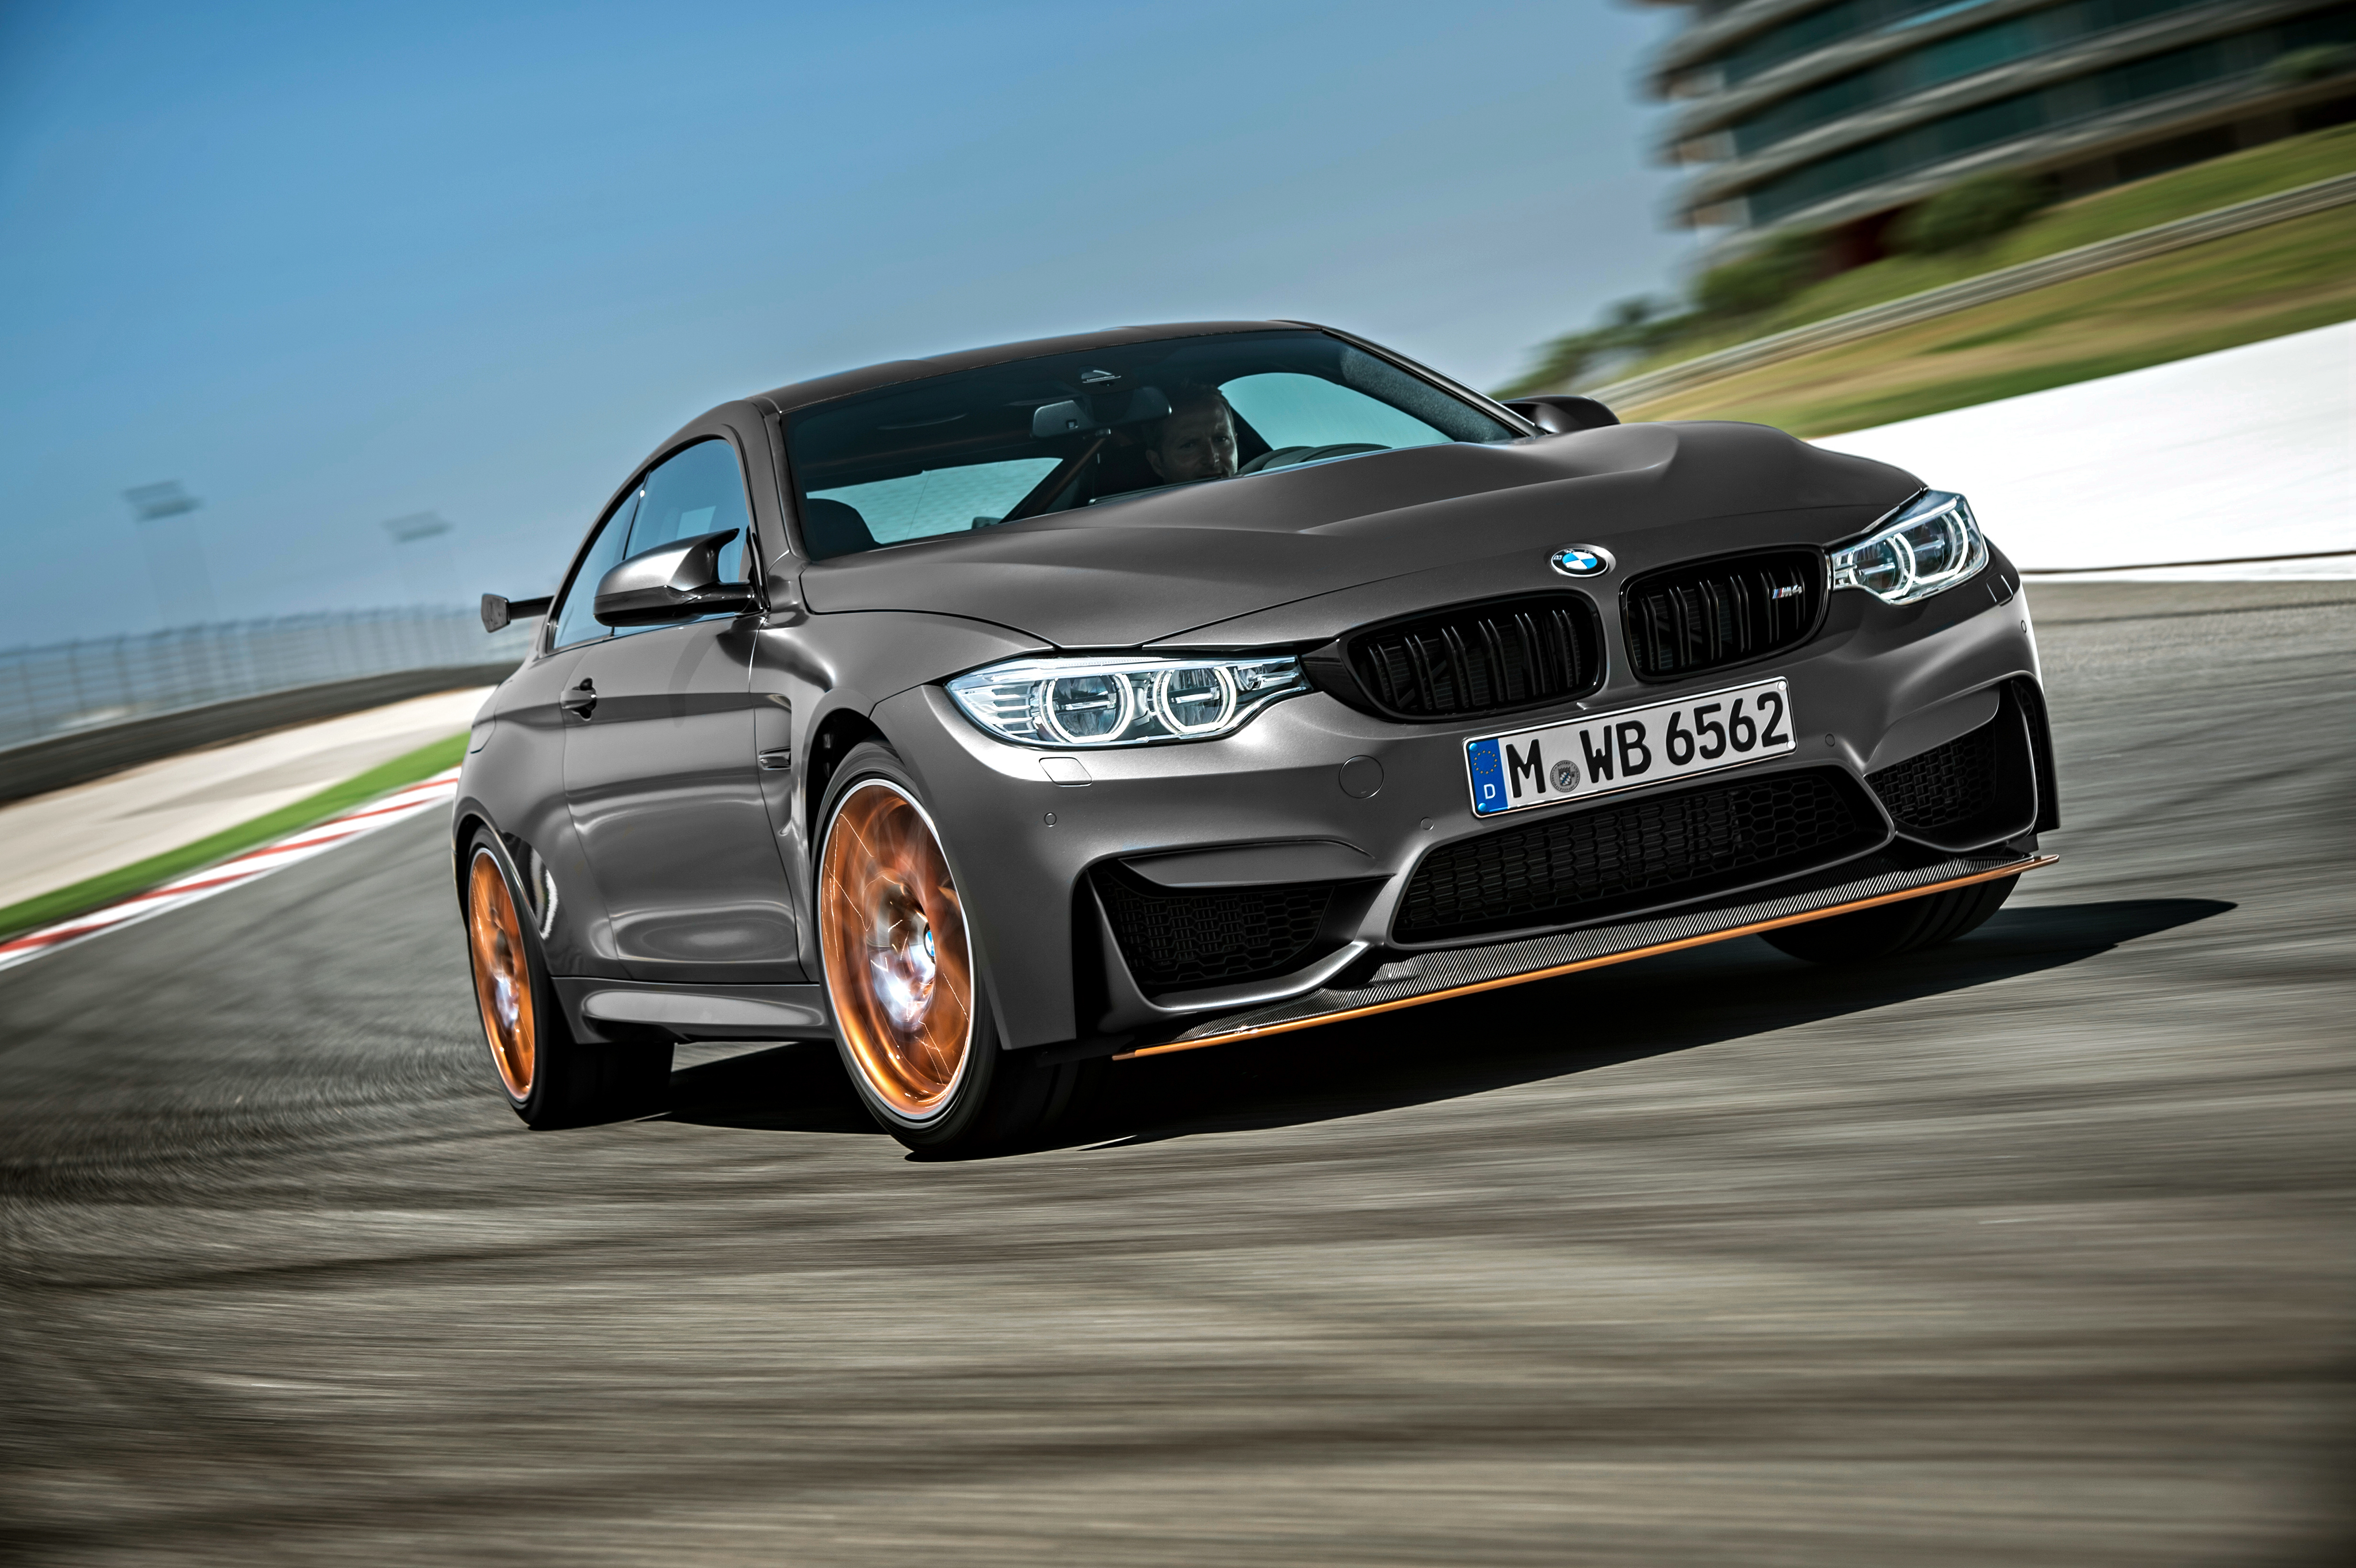 BMW_2015_M4_GTS_475301.jpg (4096×2726)